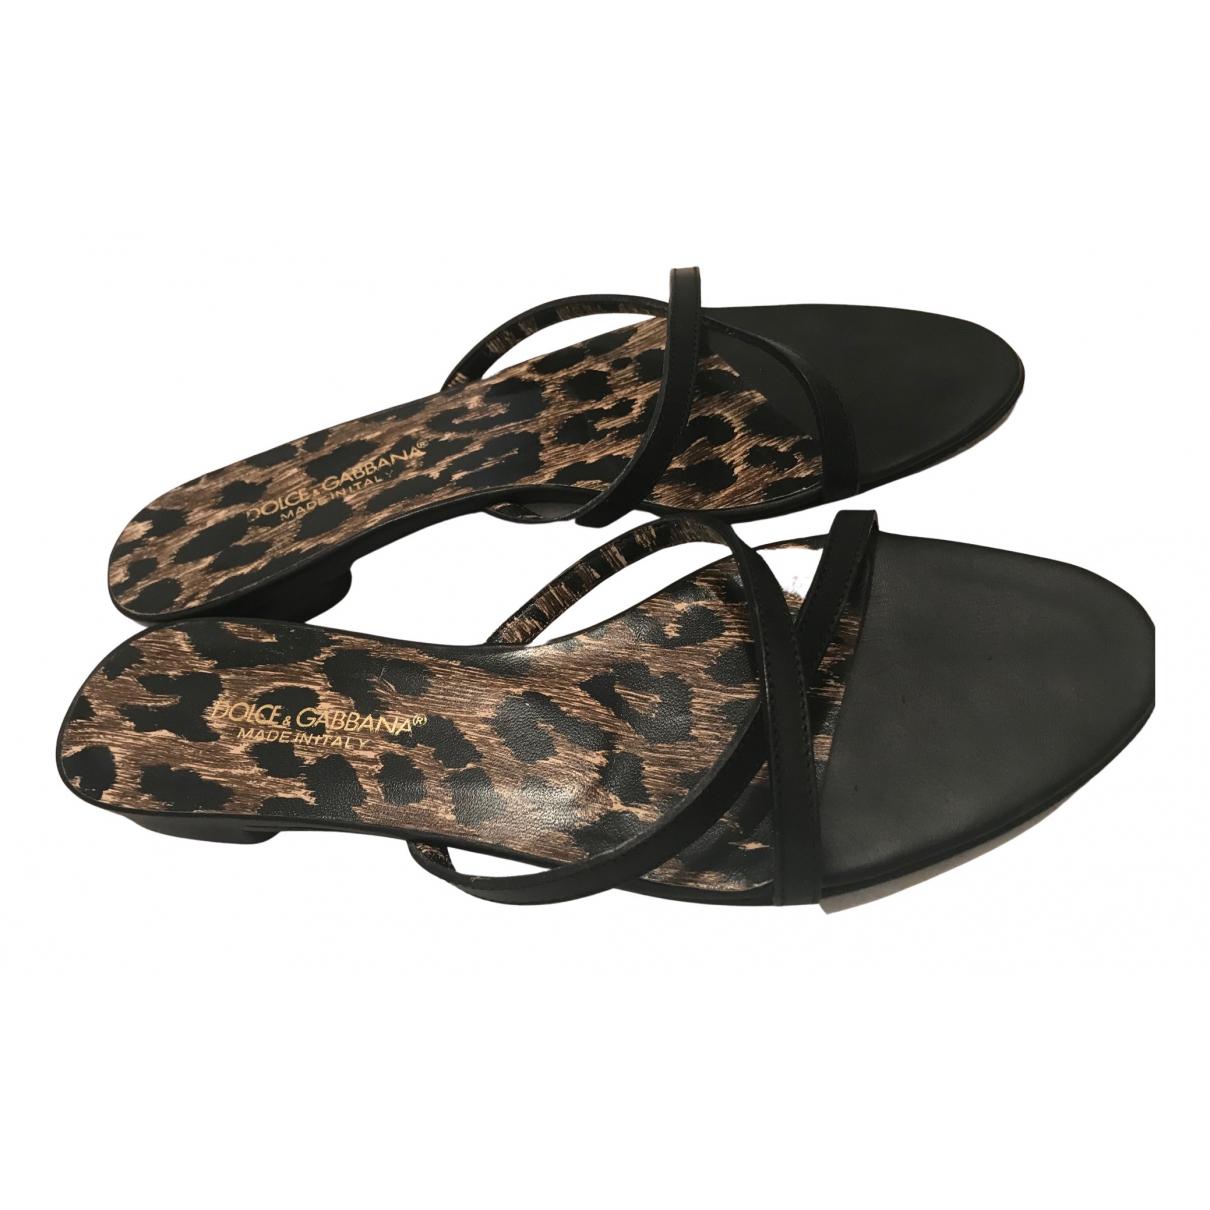 Dolce & Gabbana N Black Leather Sandals for Women 37 EU